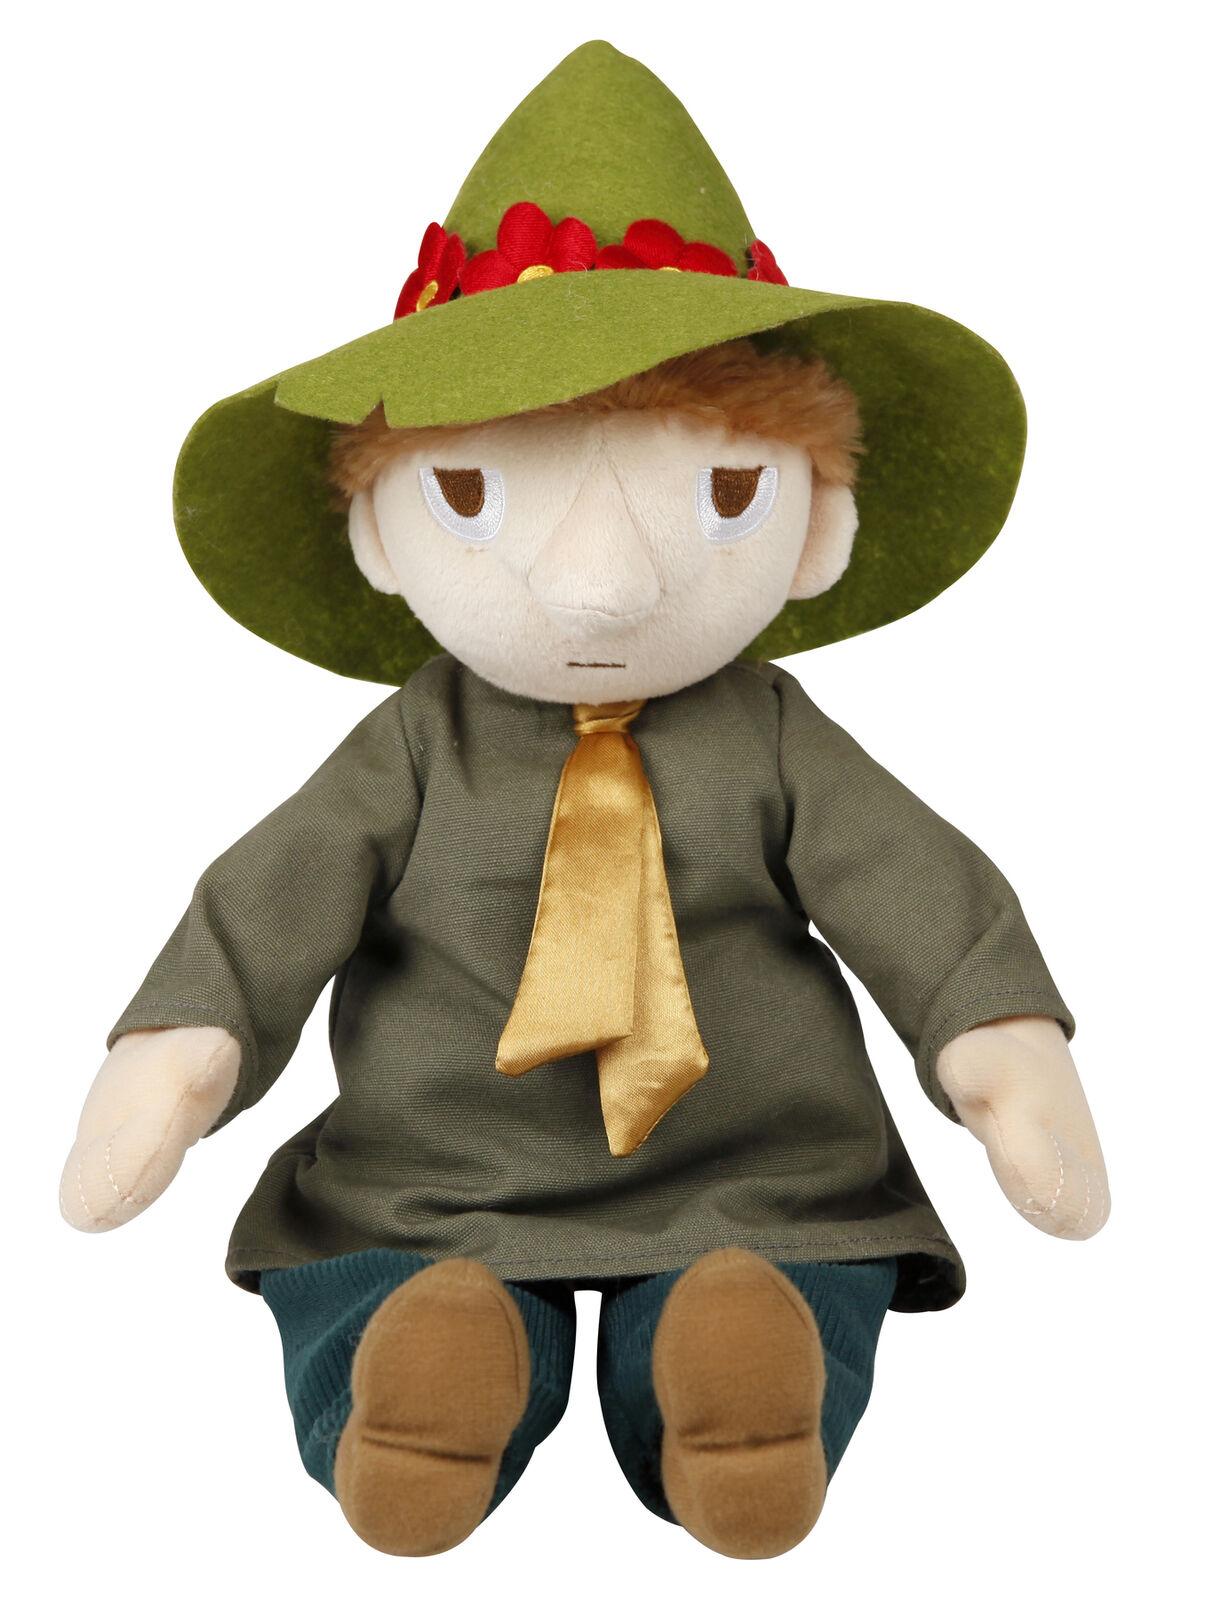 Moomin Tove 100 Anniversary Soft Toy Snufkin 38 cm Martinex